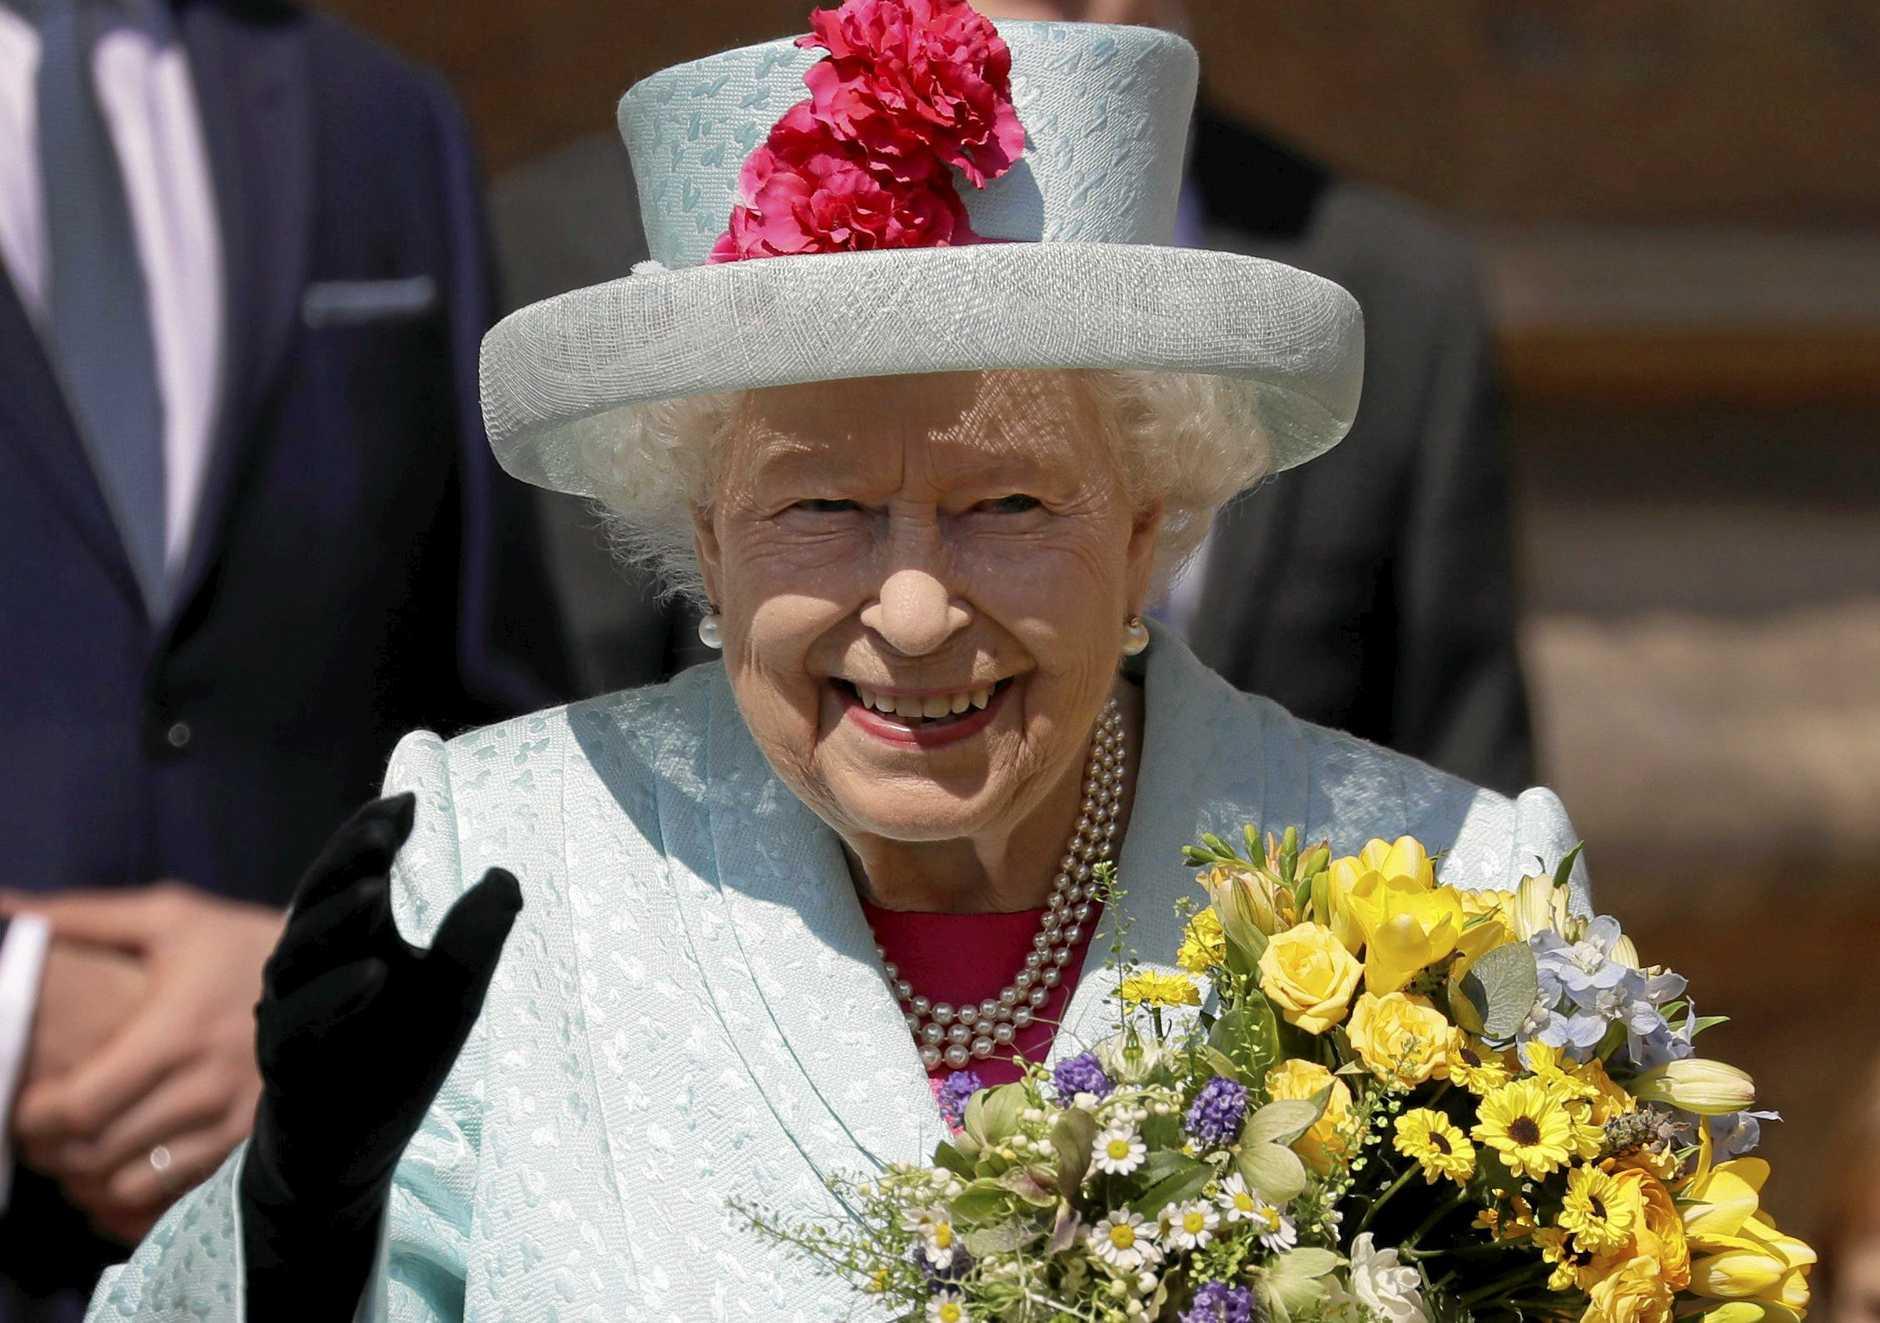 Britain's Queen Elizabeth II has sent a message to fire survivors via the Governor General of Australia.